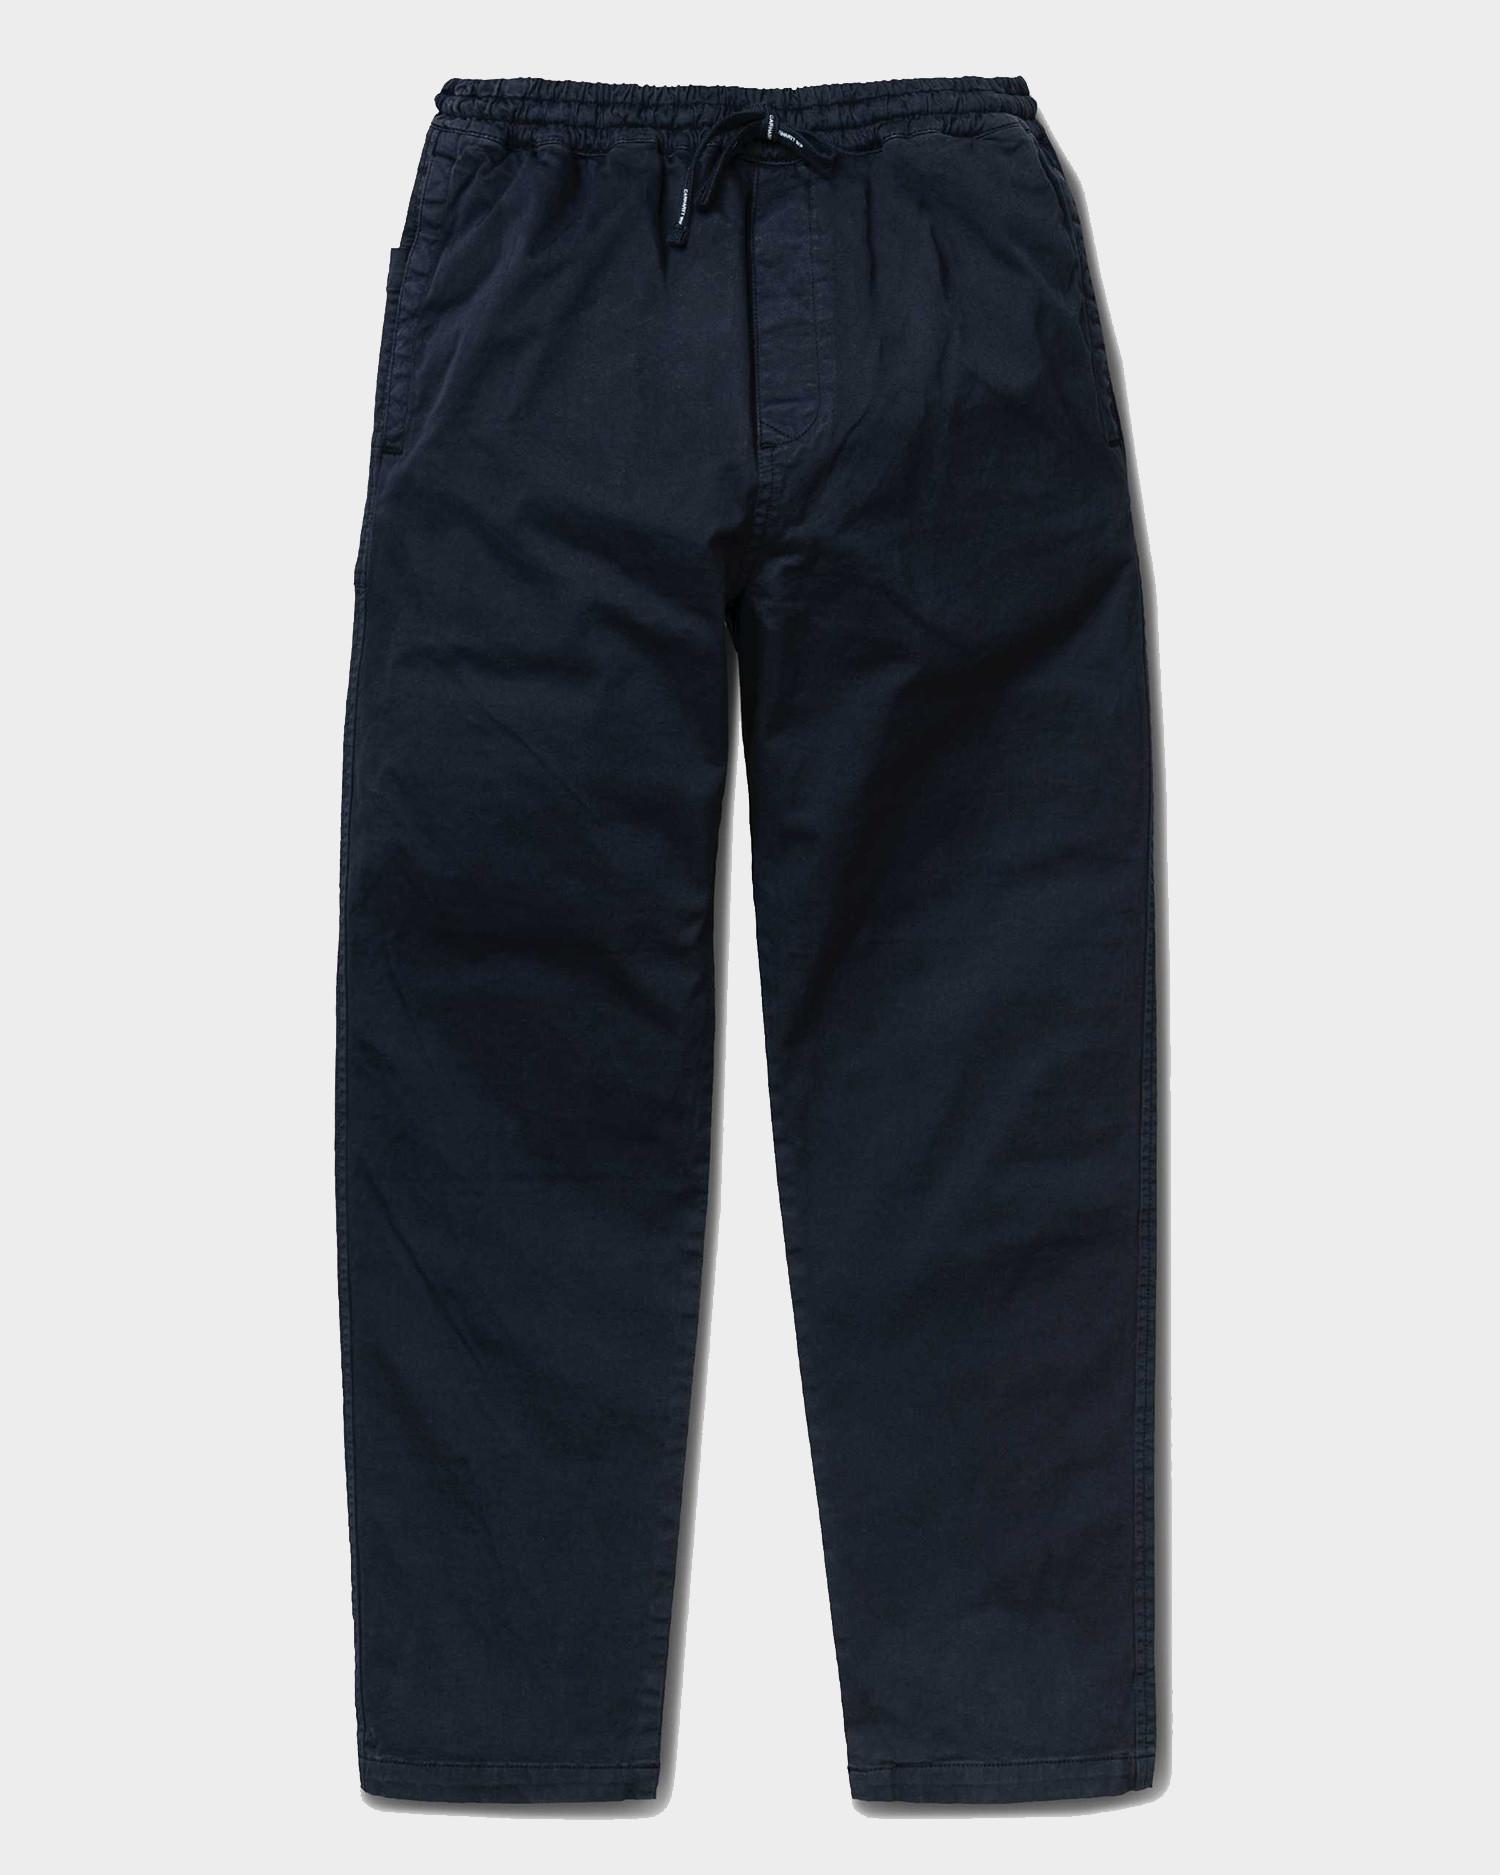 Carhartt Lawton Pant Dark Navy